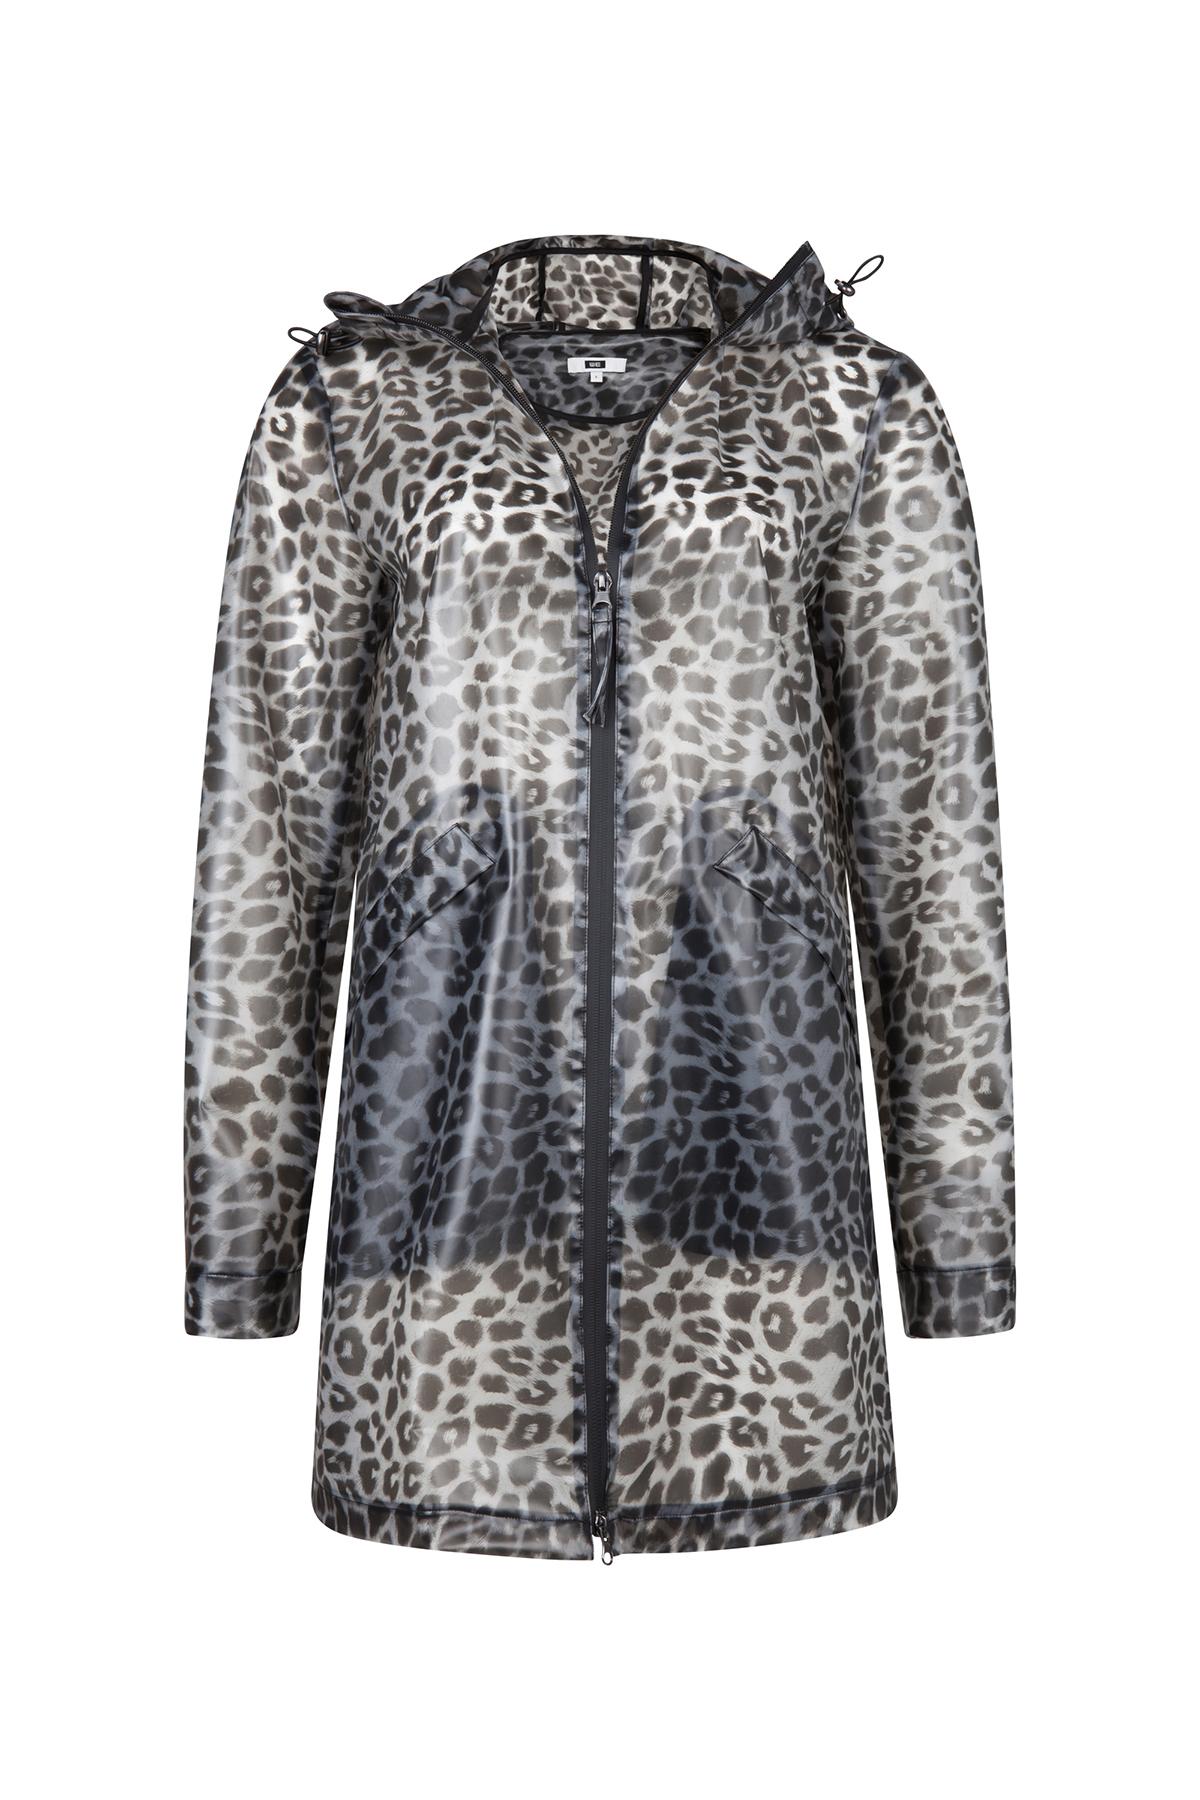 Dames luipaardprint regenjas | 94339192 WE Fashion